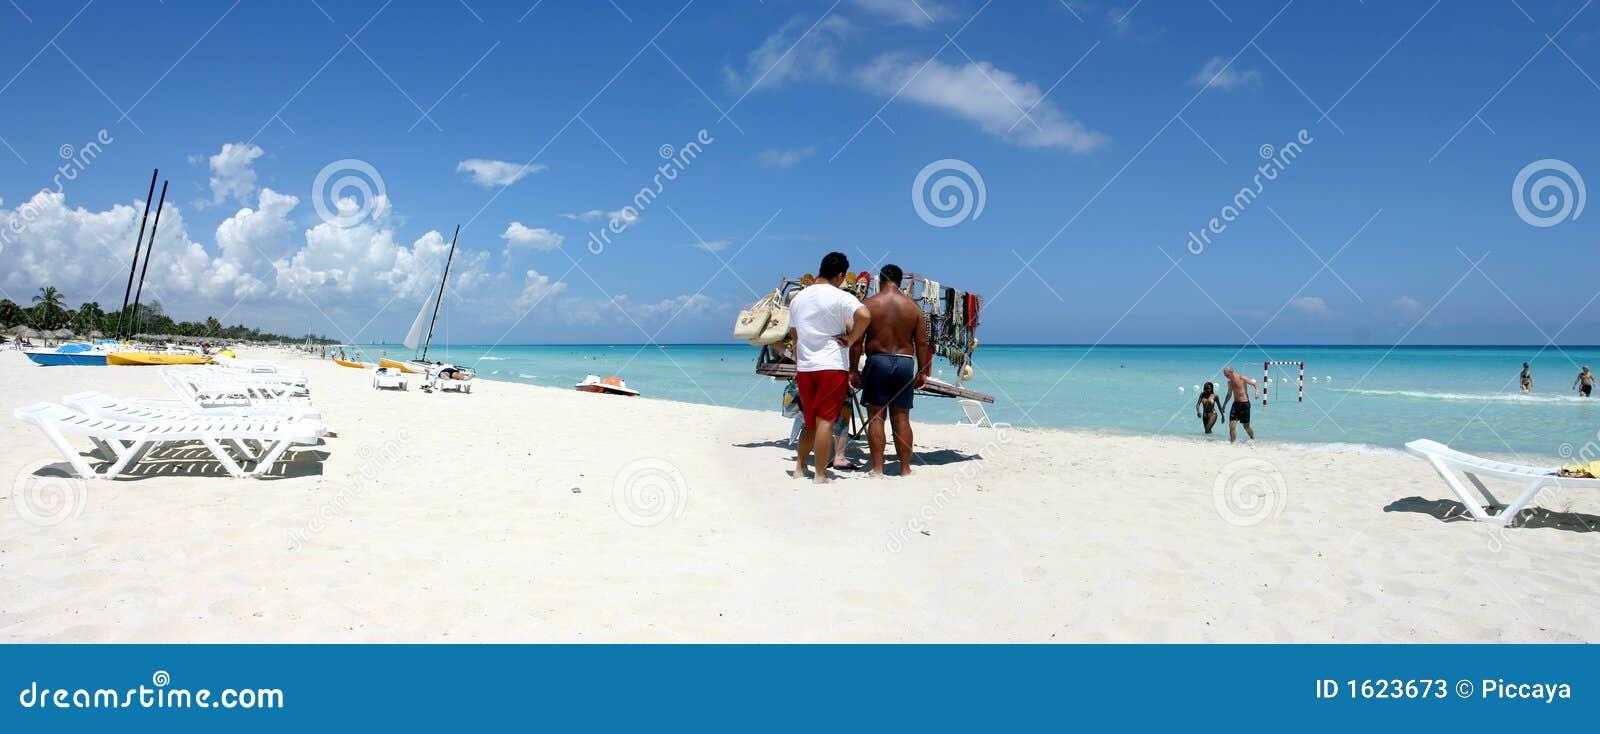 Turism av mass i Kuba